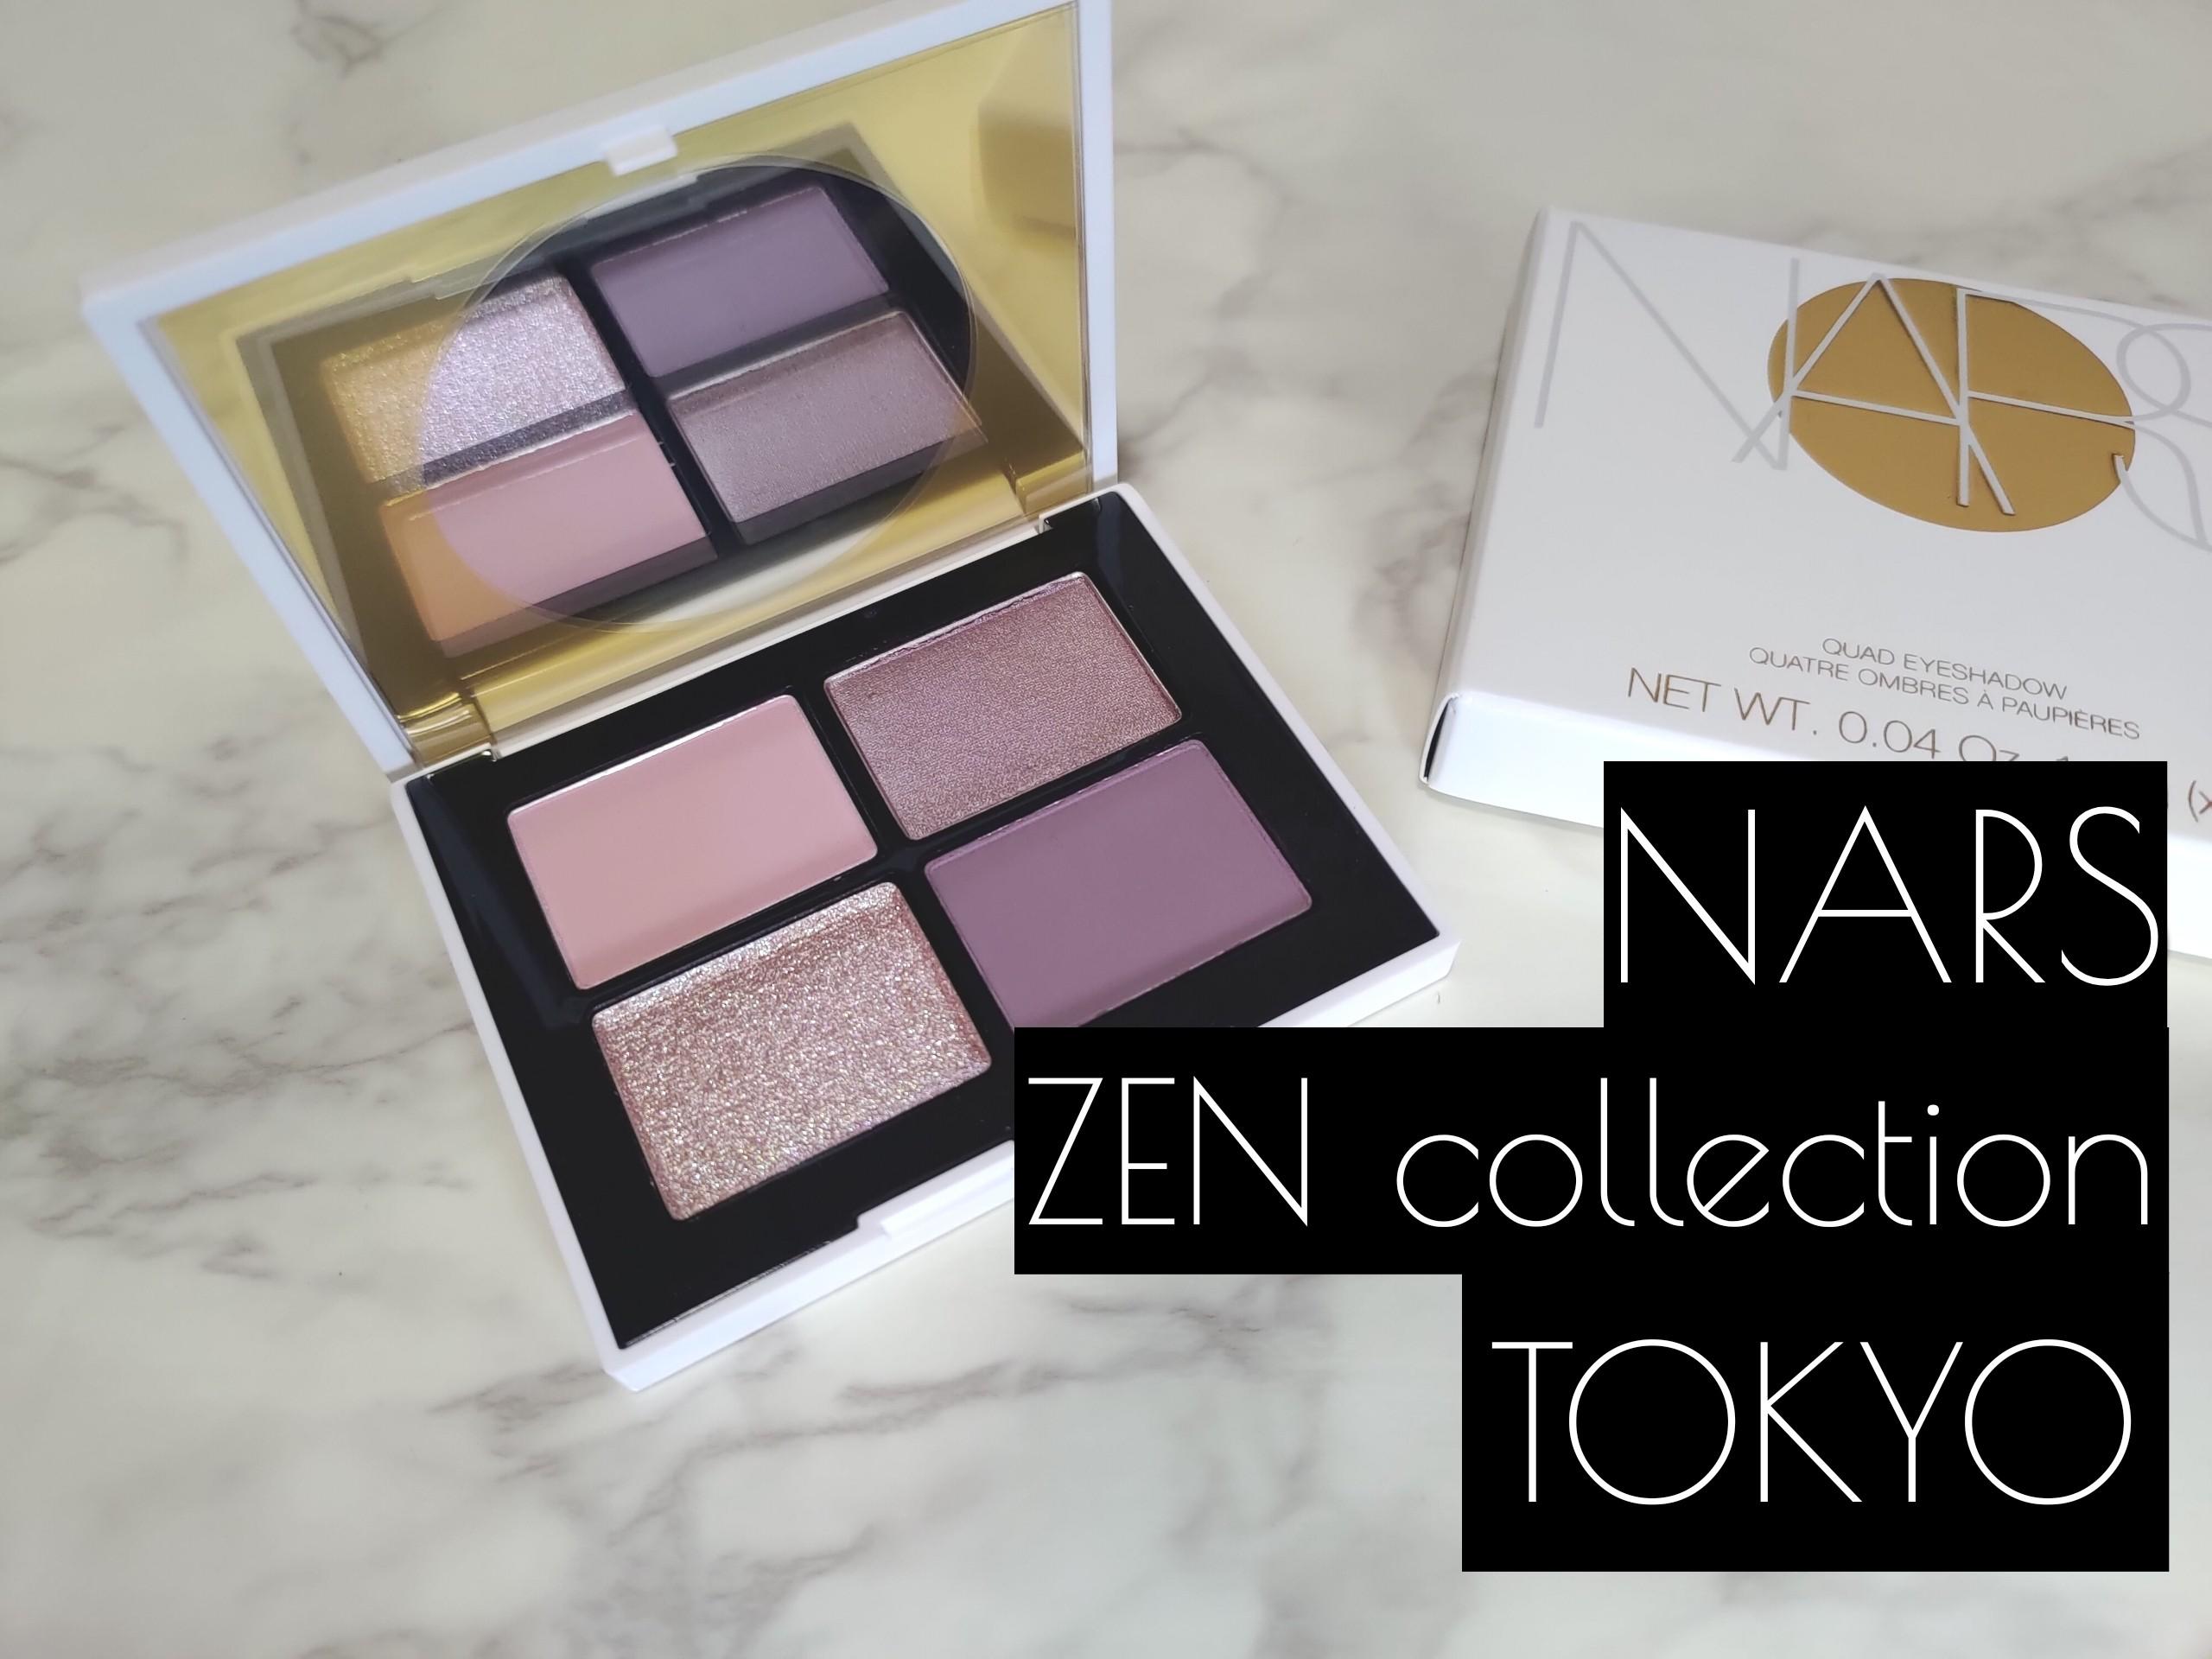 NARS ZEN COLLECTION TOKYO 日本限定